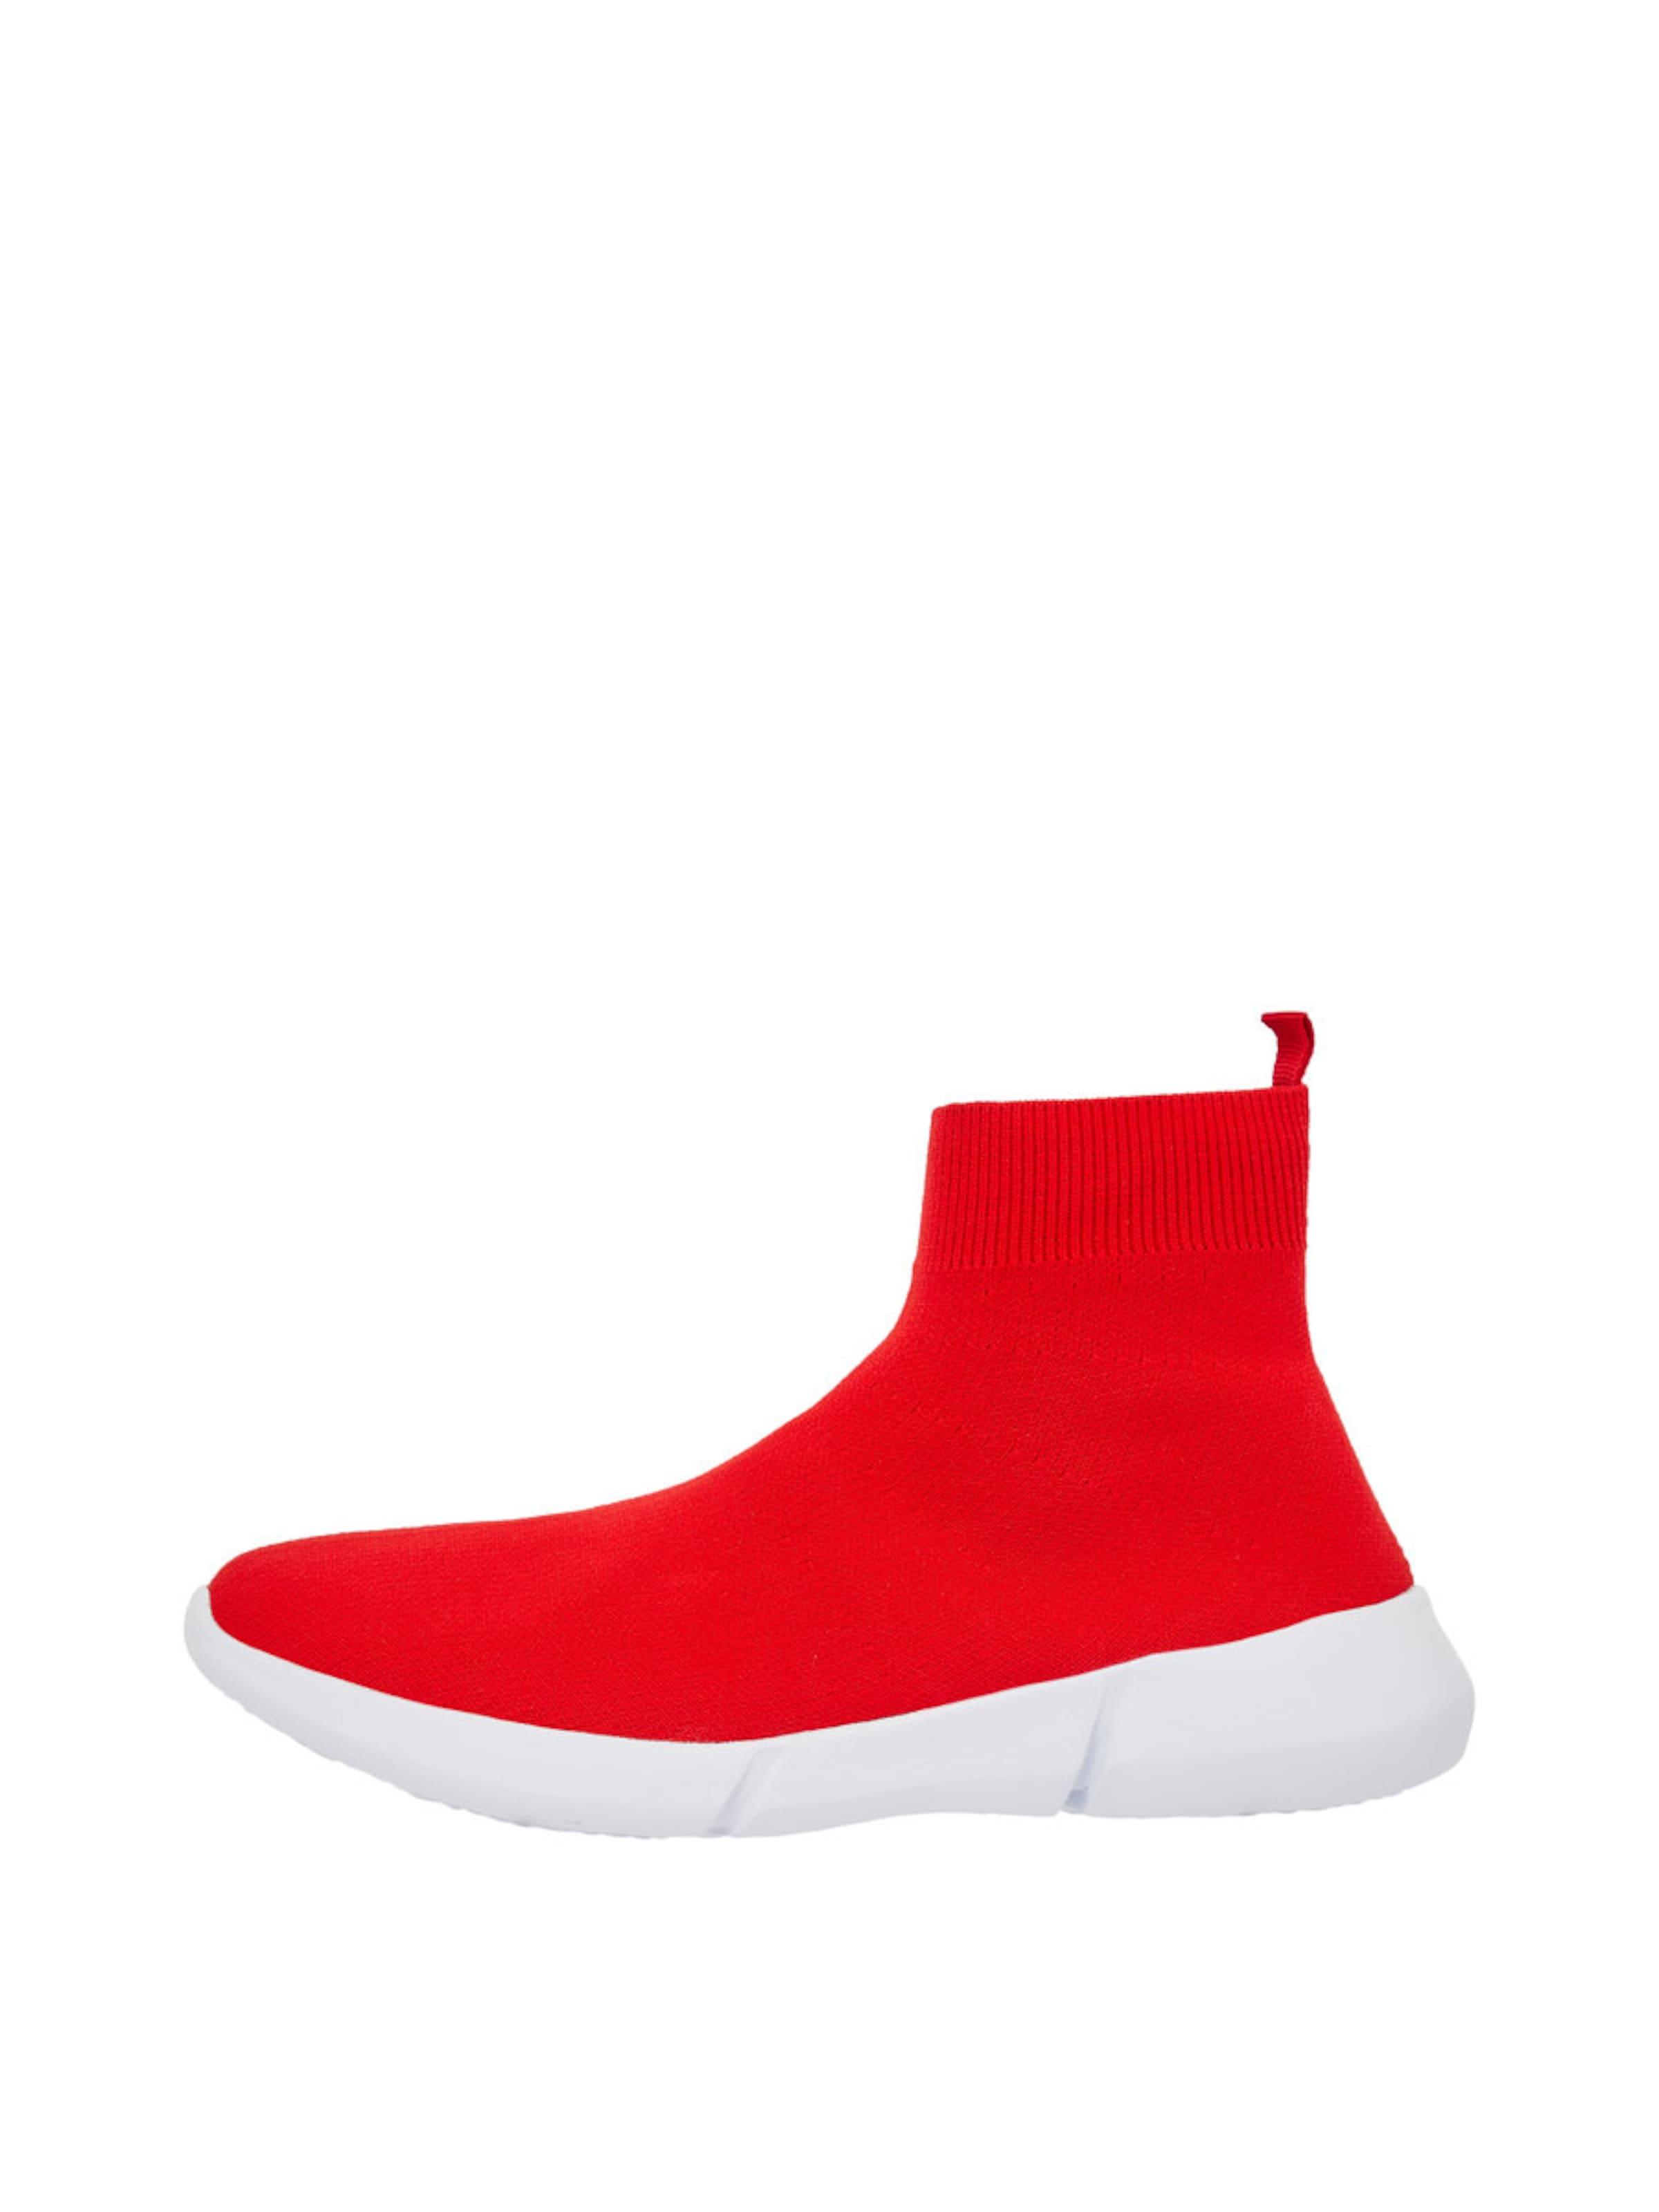 Haltbare Haltbare Haltbare Mode billige Schuhe Bianco | Sneaker Schuhe Gut getragene Schuhe e9b5ef